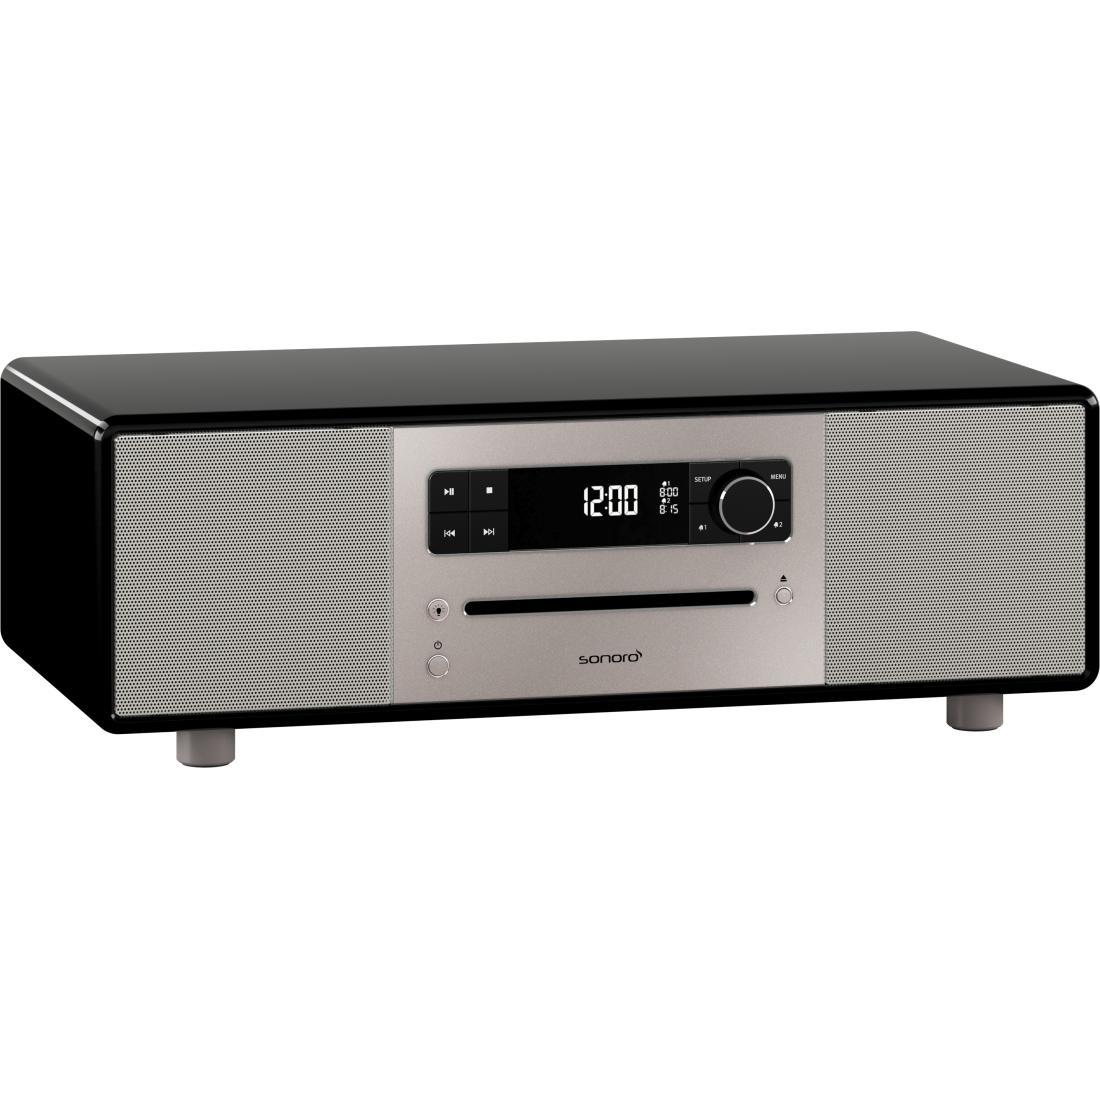 sonoro Lounge Audiosystem schwarz